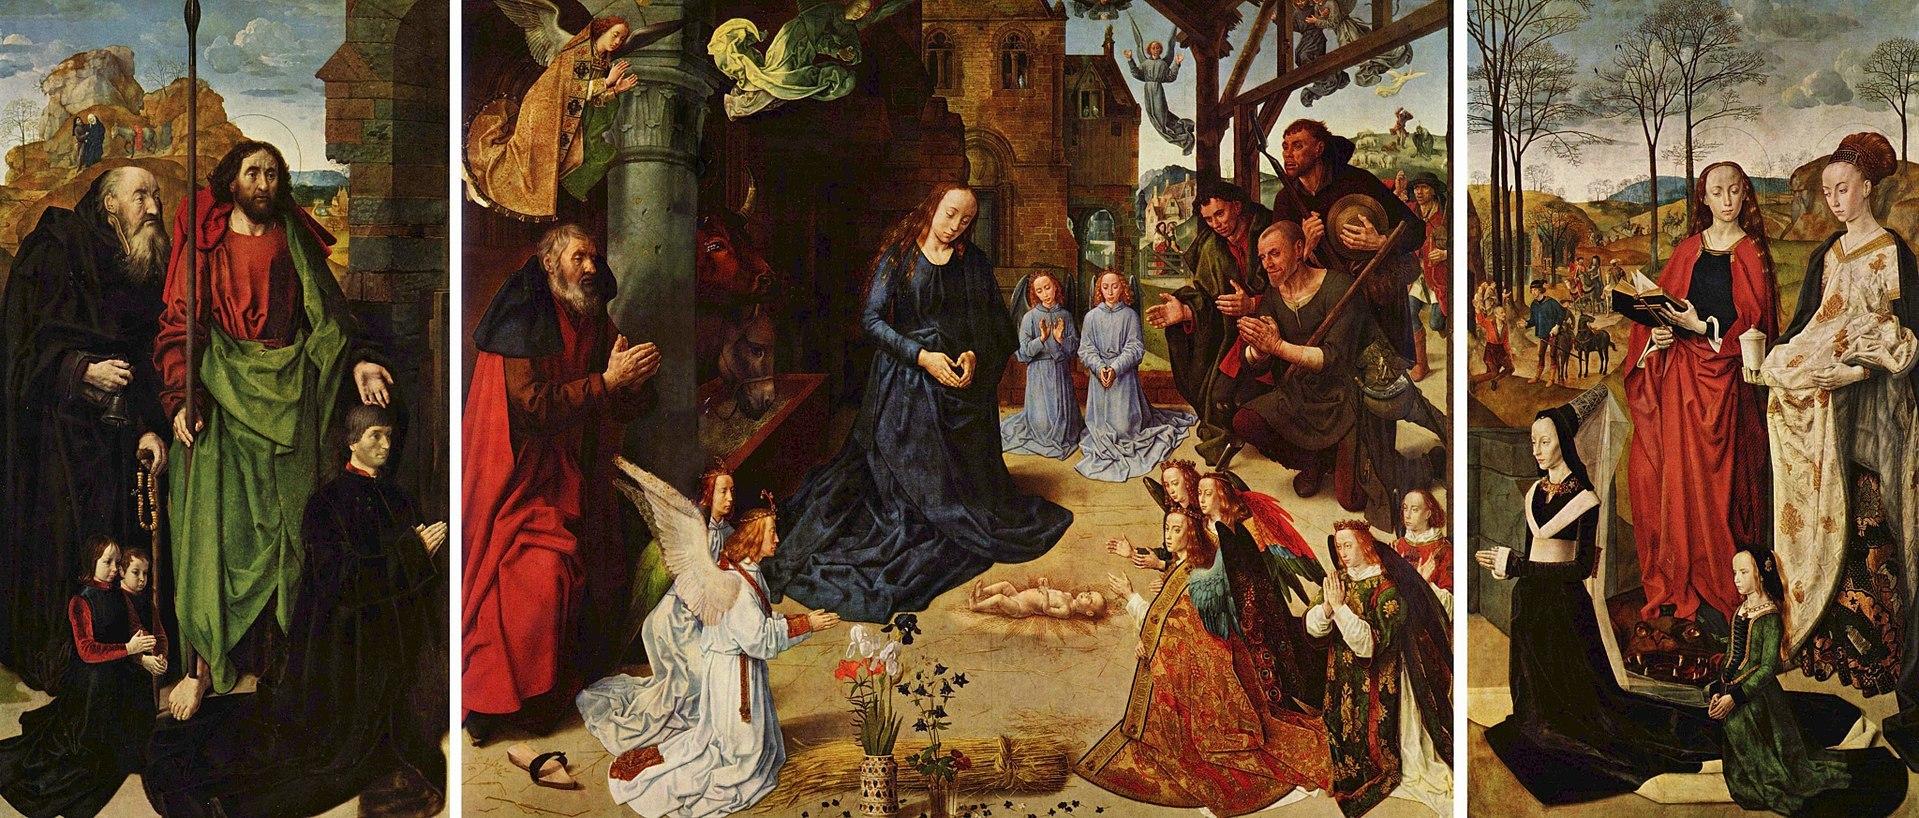 HUGO VAN DER GOES (1435 / 1440-1482) - Le triptyque Portinari, couleur / bois, 1473-77 Florence, Galleria degli Uffizi